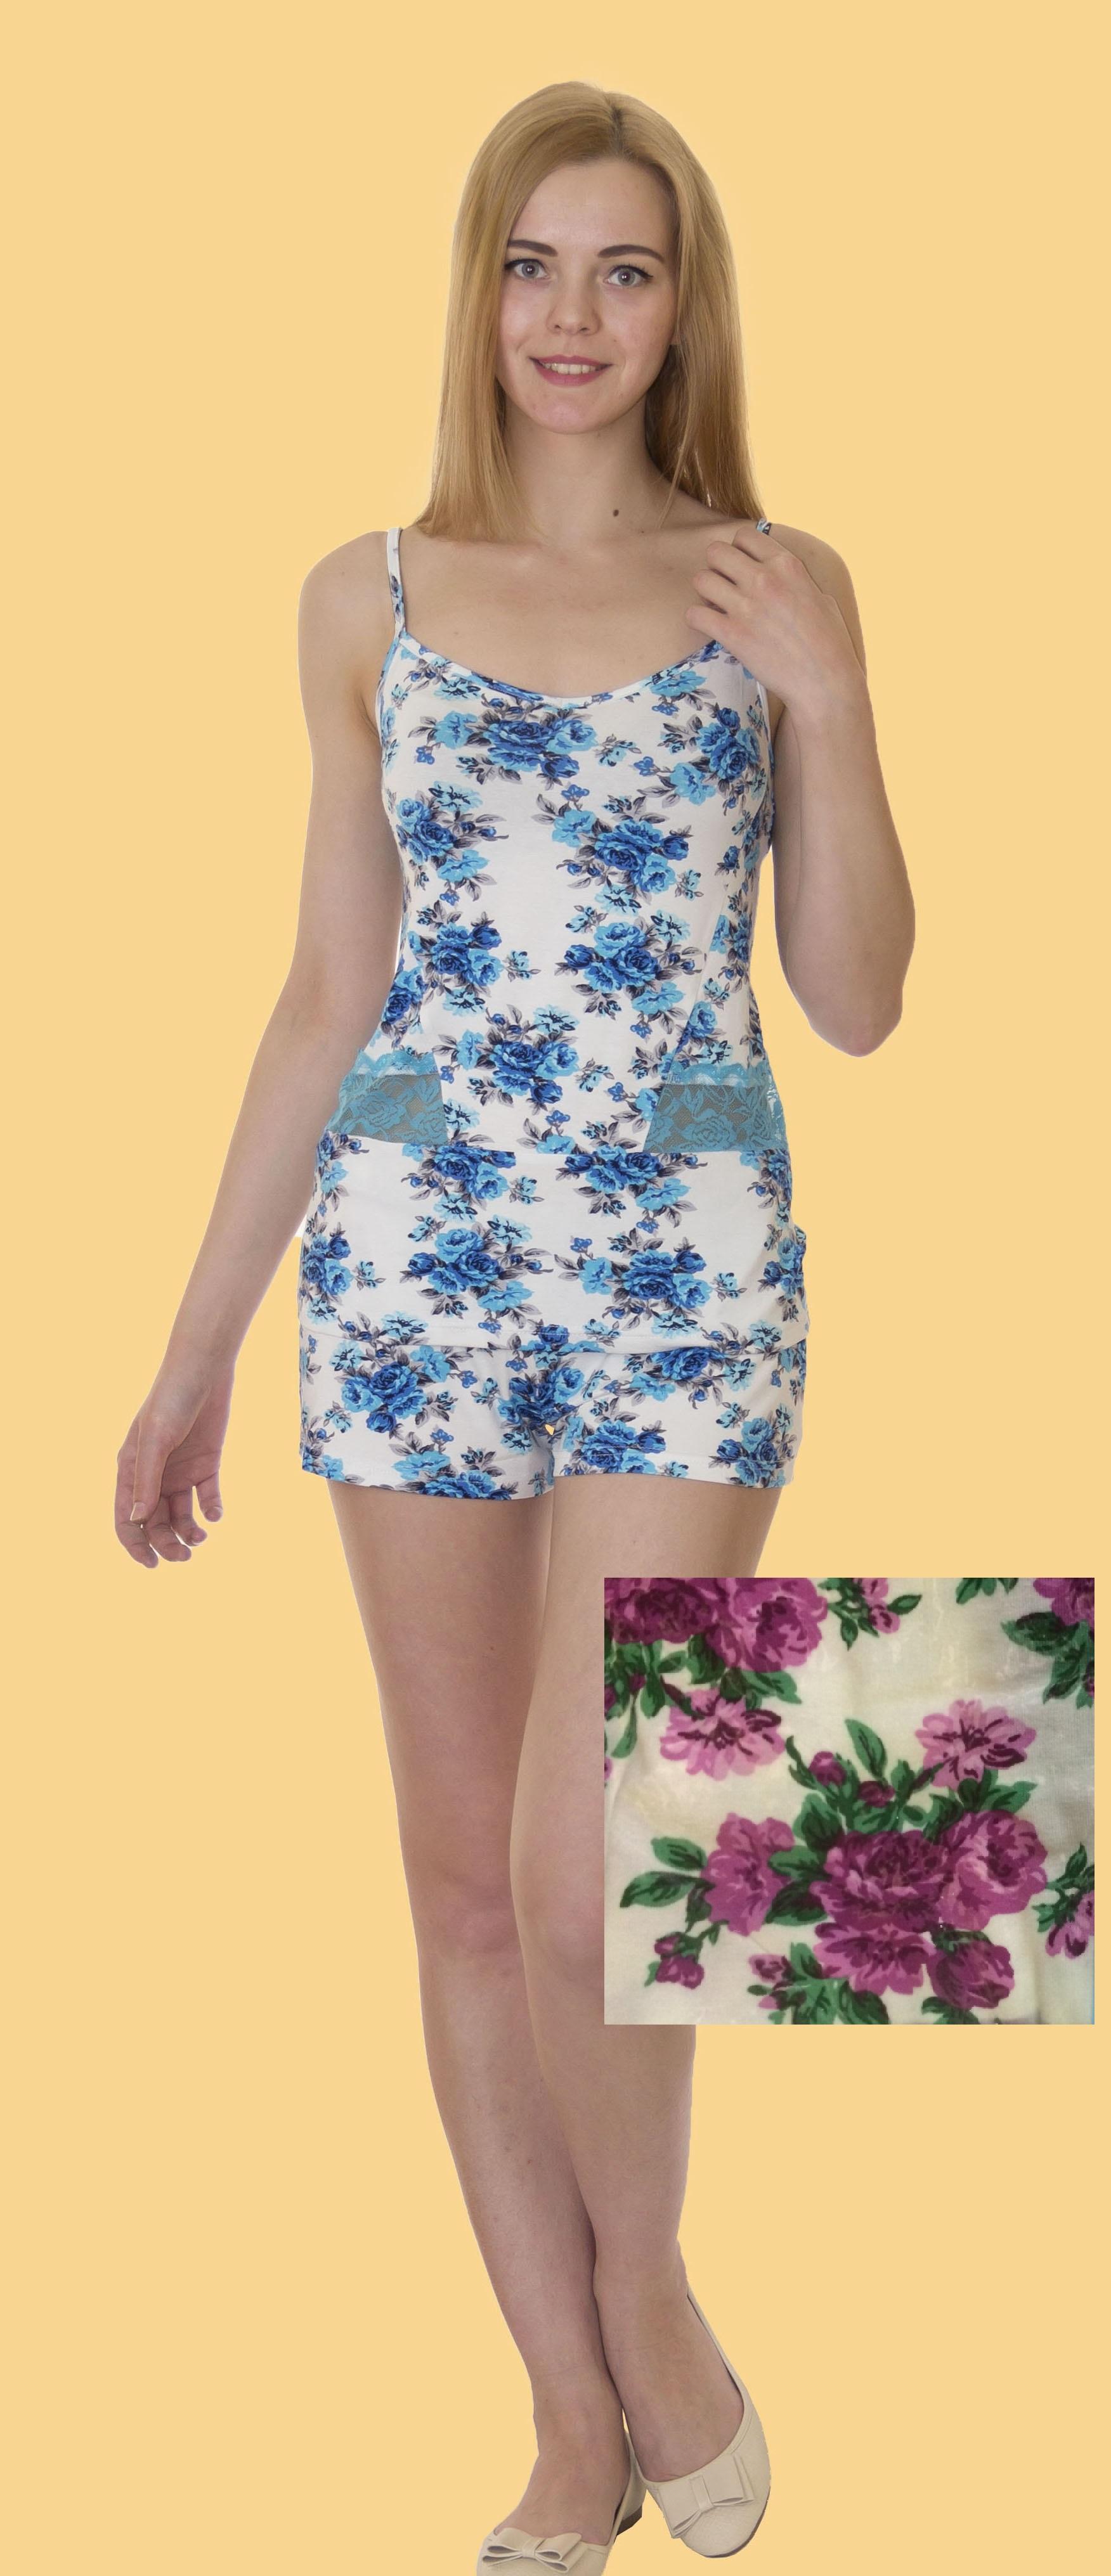 Пижамы Лотос Пижама Ассоль Цвет: Розовые Цветы (M) пижама жен mia cara майка шорты botanical aw15 ubl lst 264 р 42 44 1119503